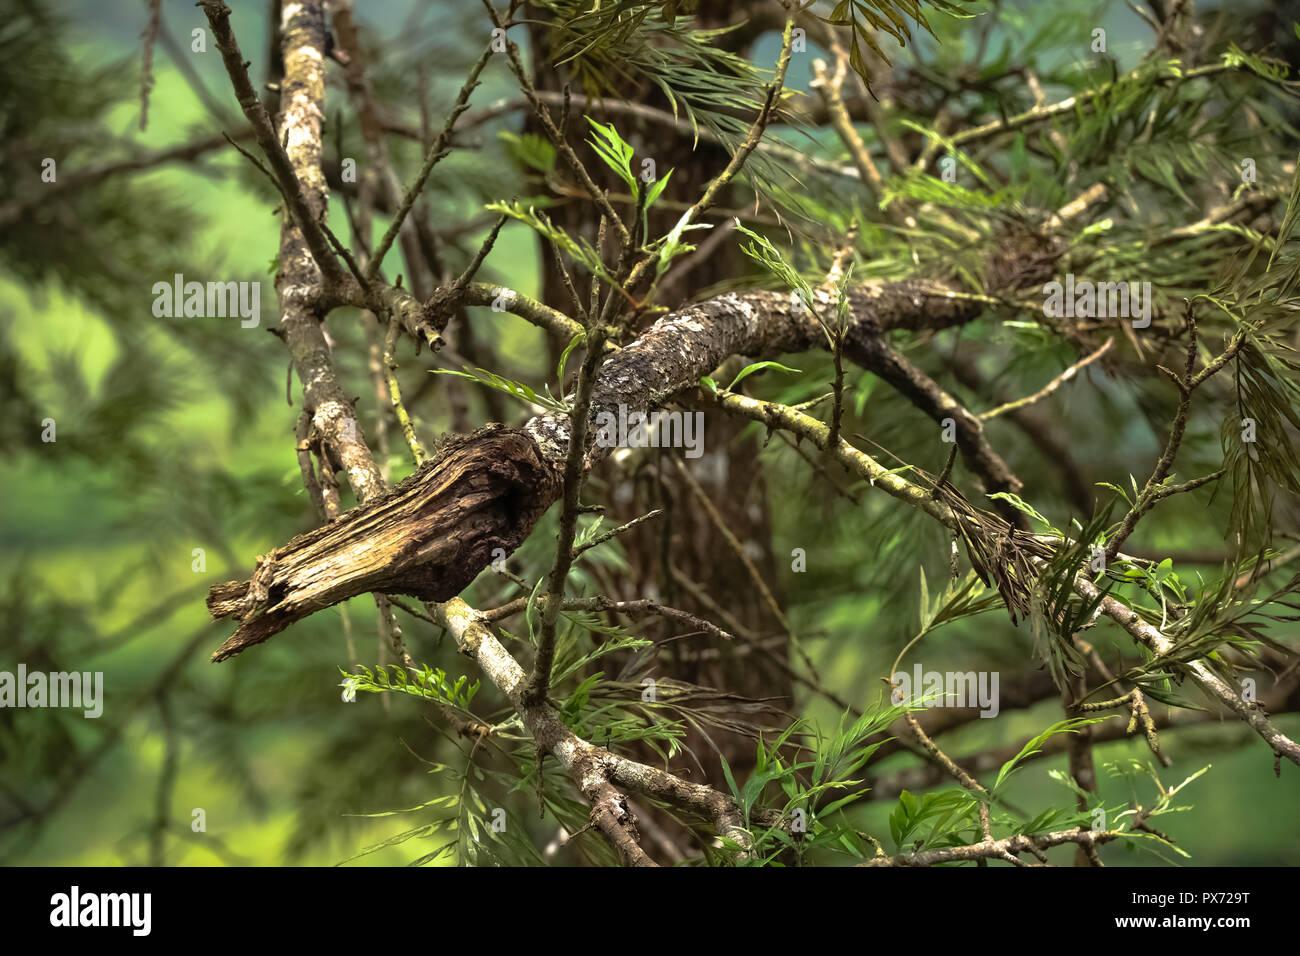 Twig crafts - Stock Image